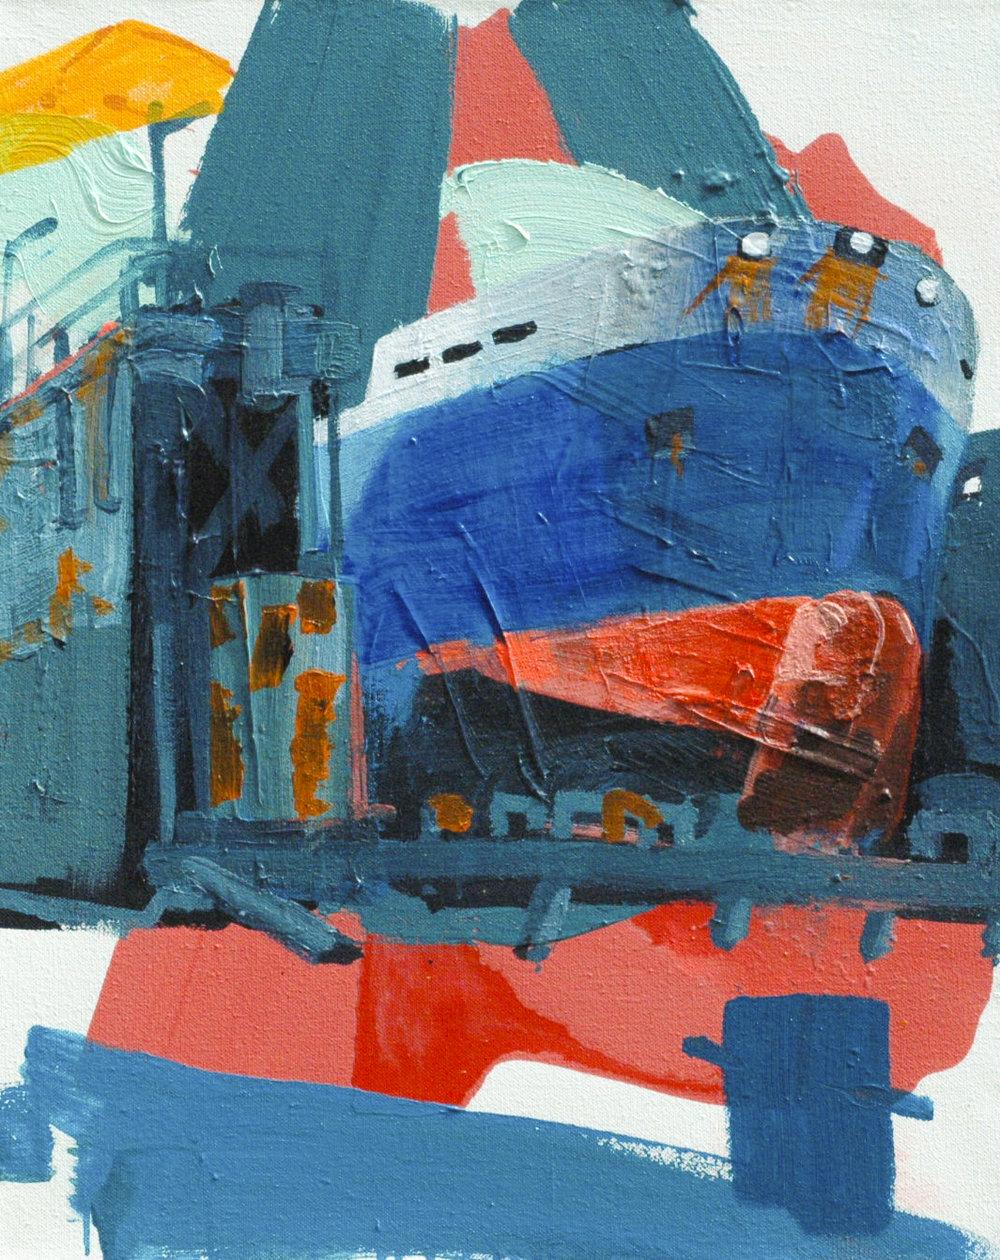 Rotterdam Drydock #2_80 x 65 cm_Acrylicpaint emulsion on Canvas_Hagens2015-2-2.jpg